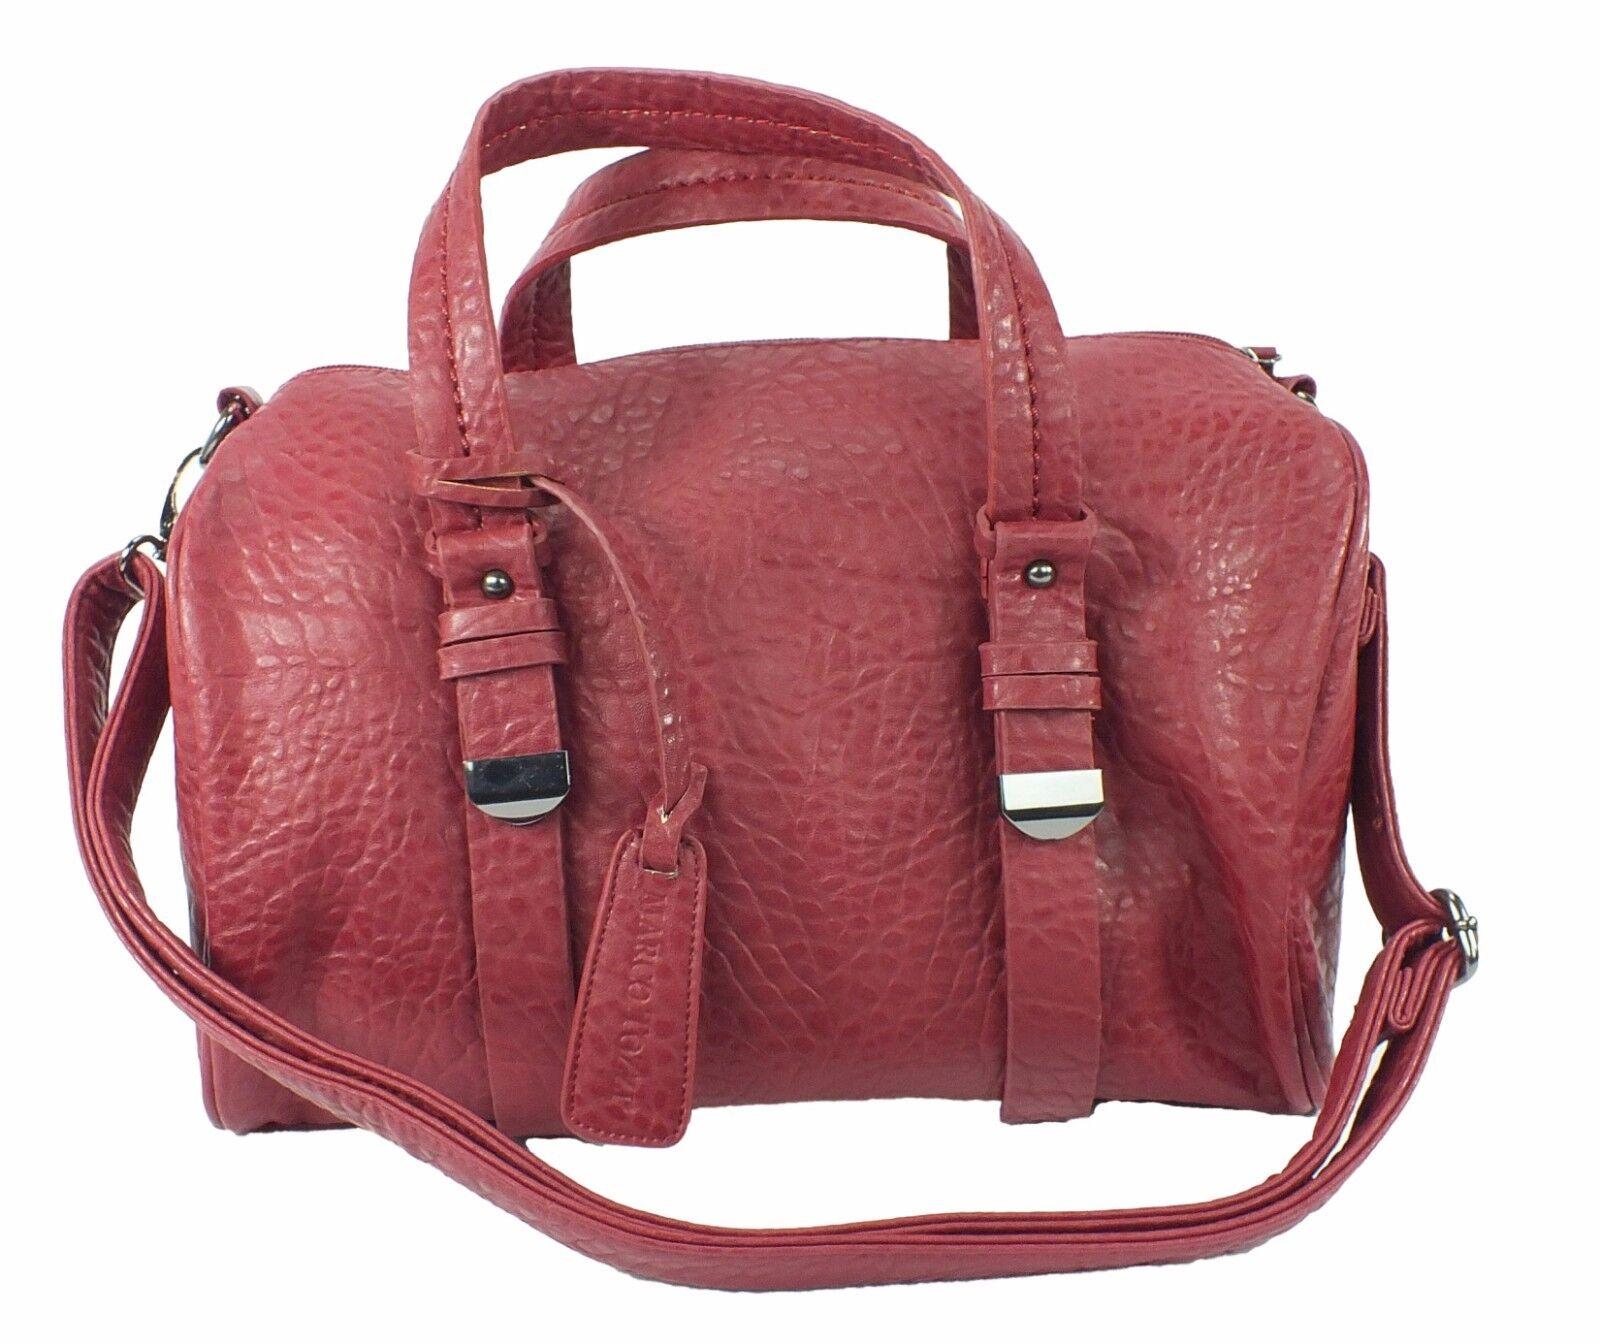 Marco Tozzi Handtasche Henkeltasche bordeaux rot oder braun 898